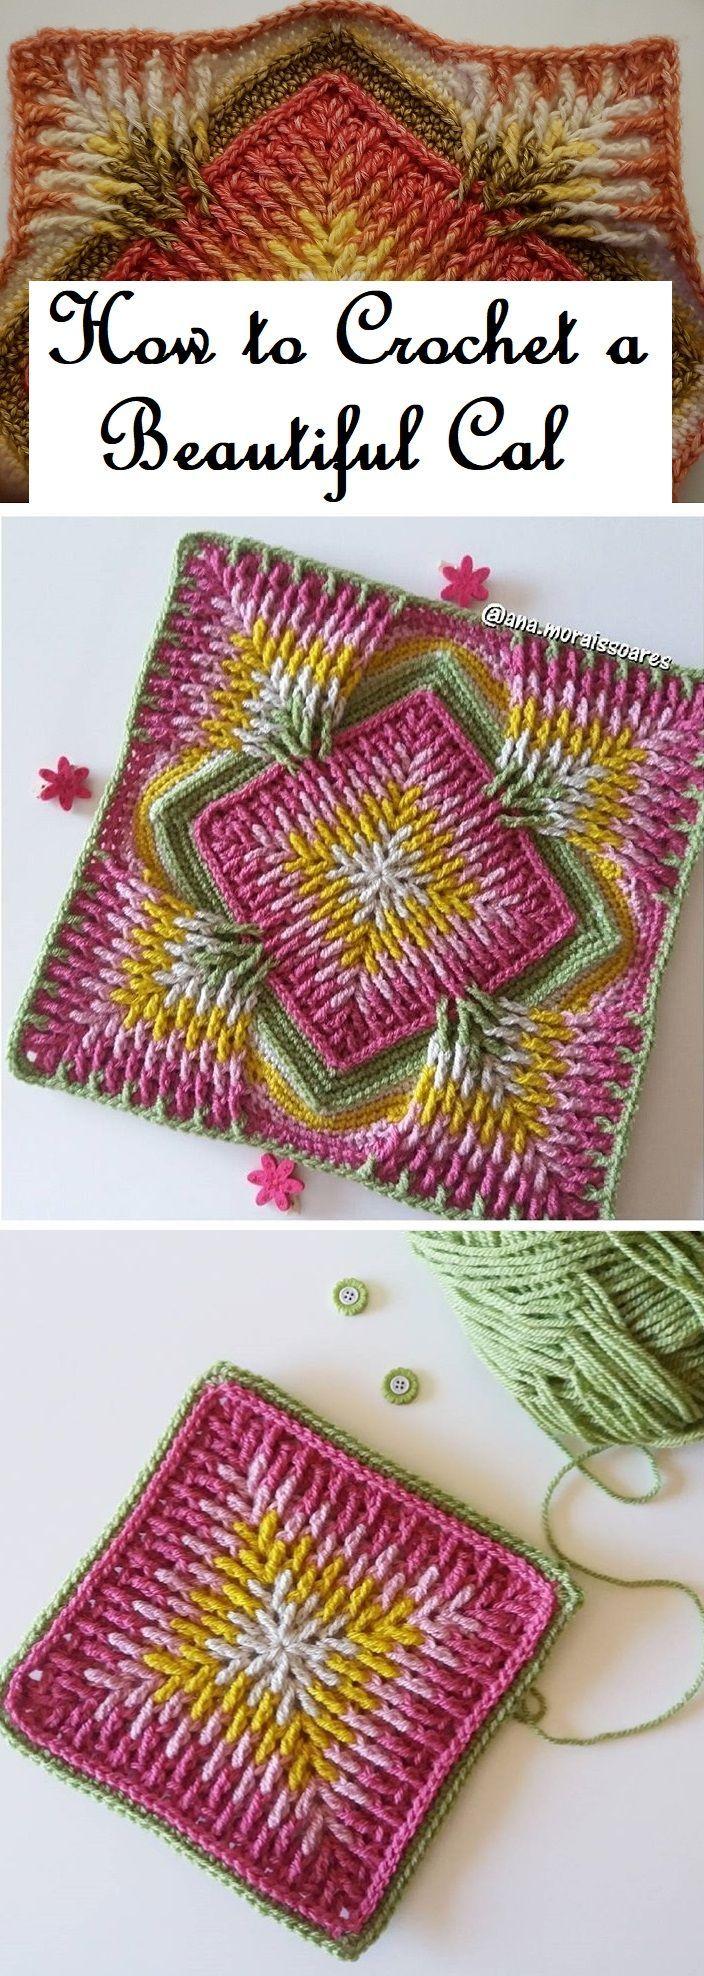 Crochet Cal Tutorial – Crochet #